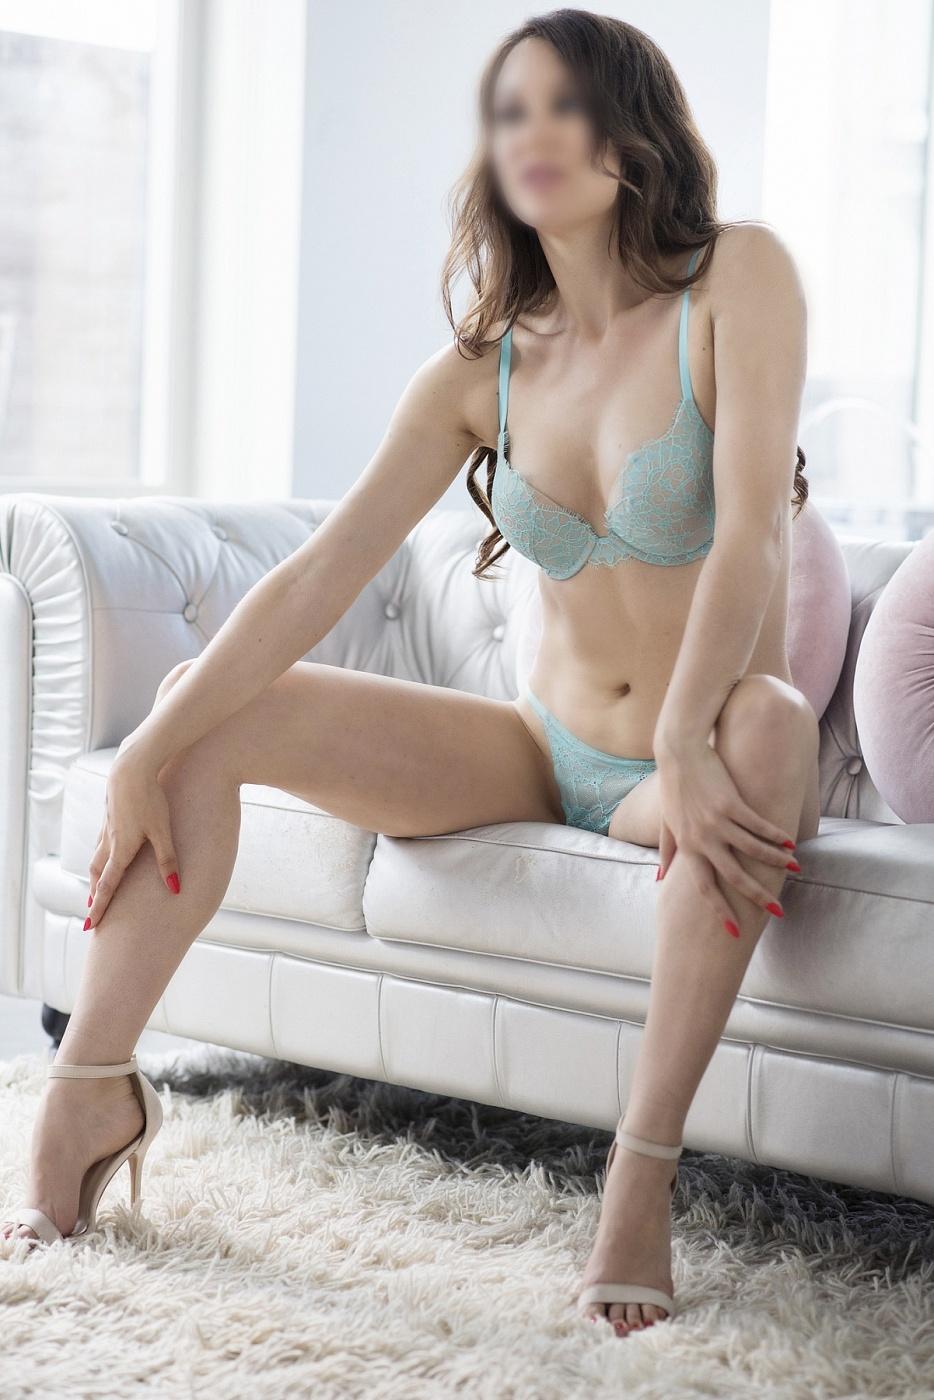 Rhea Lissette